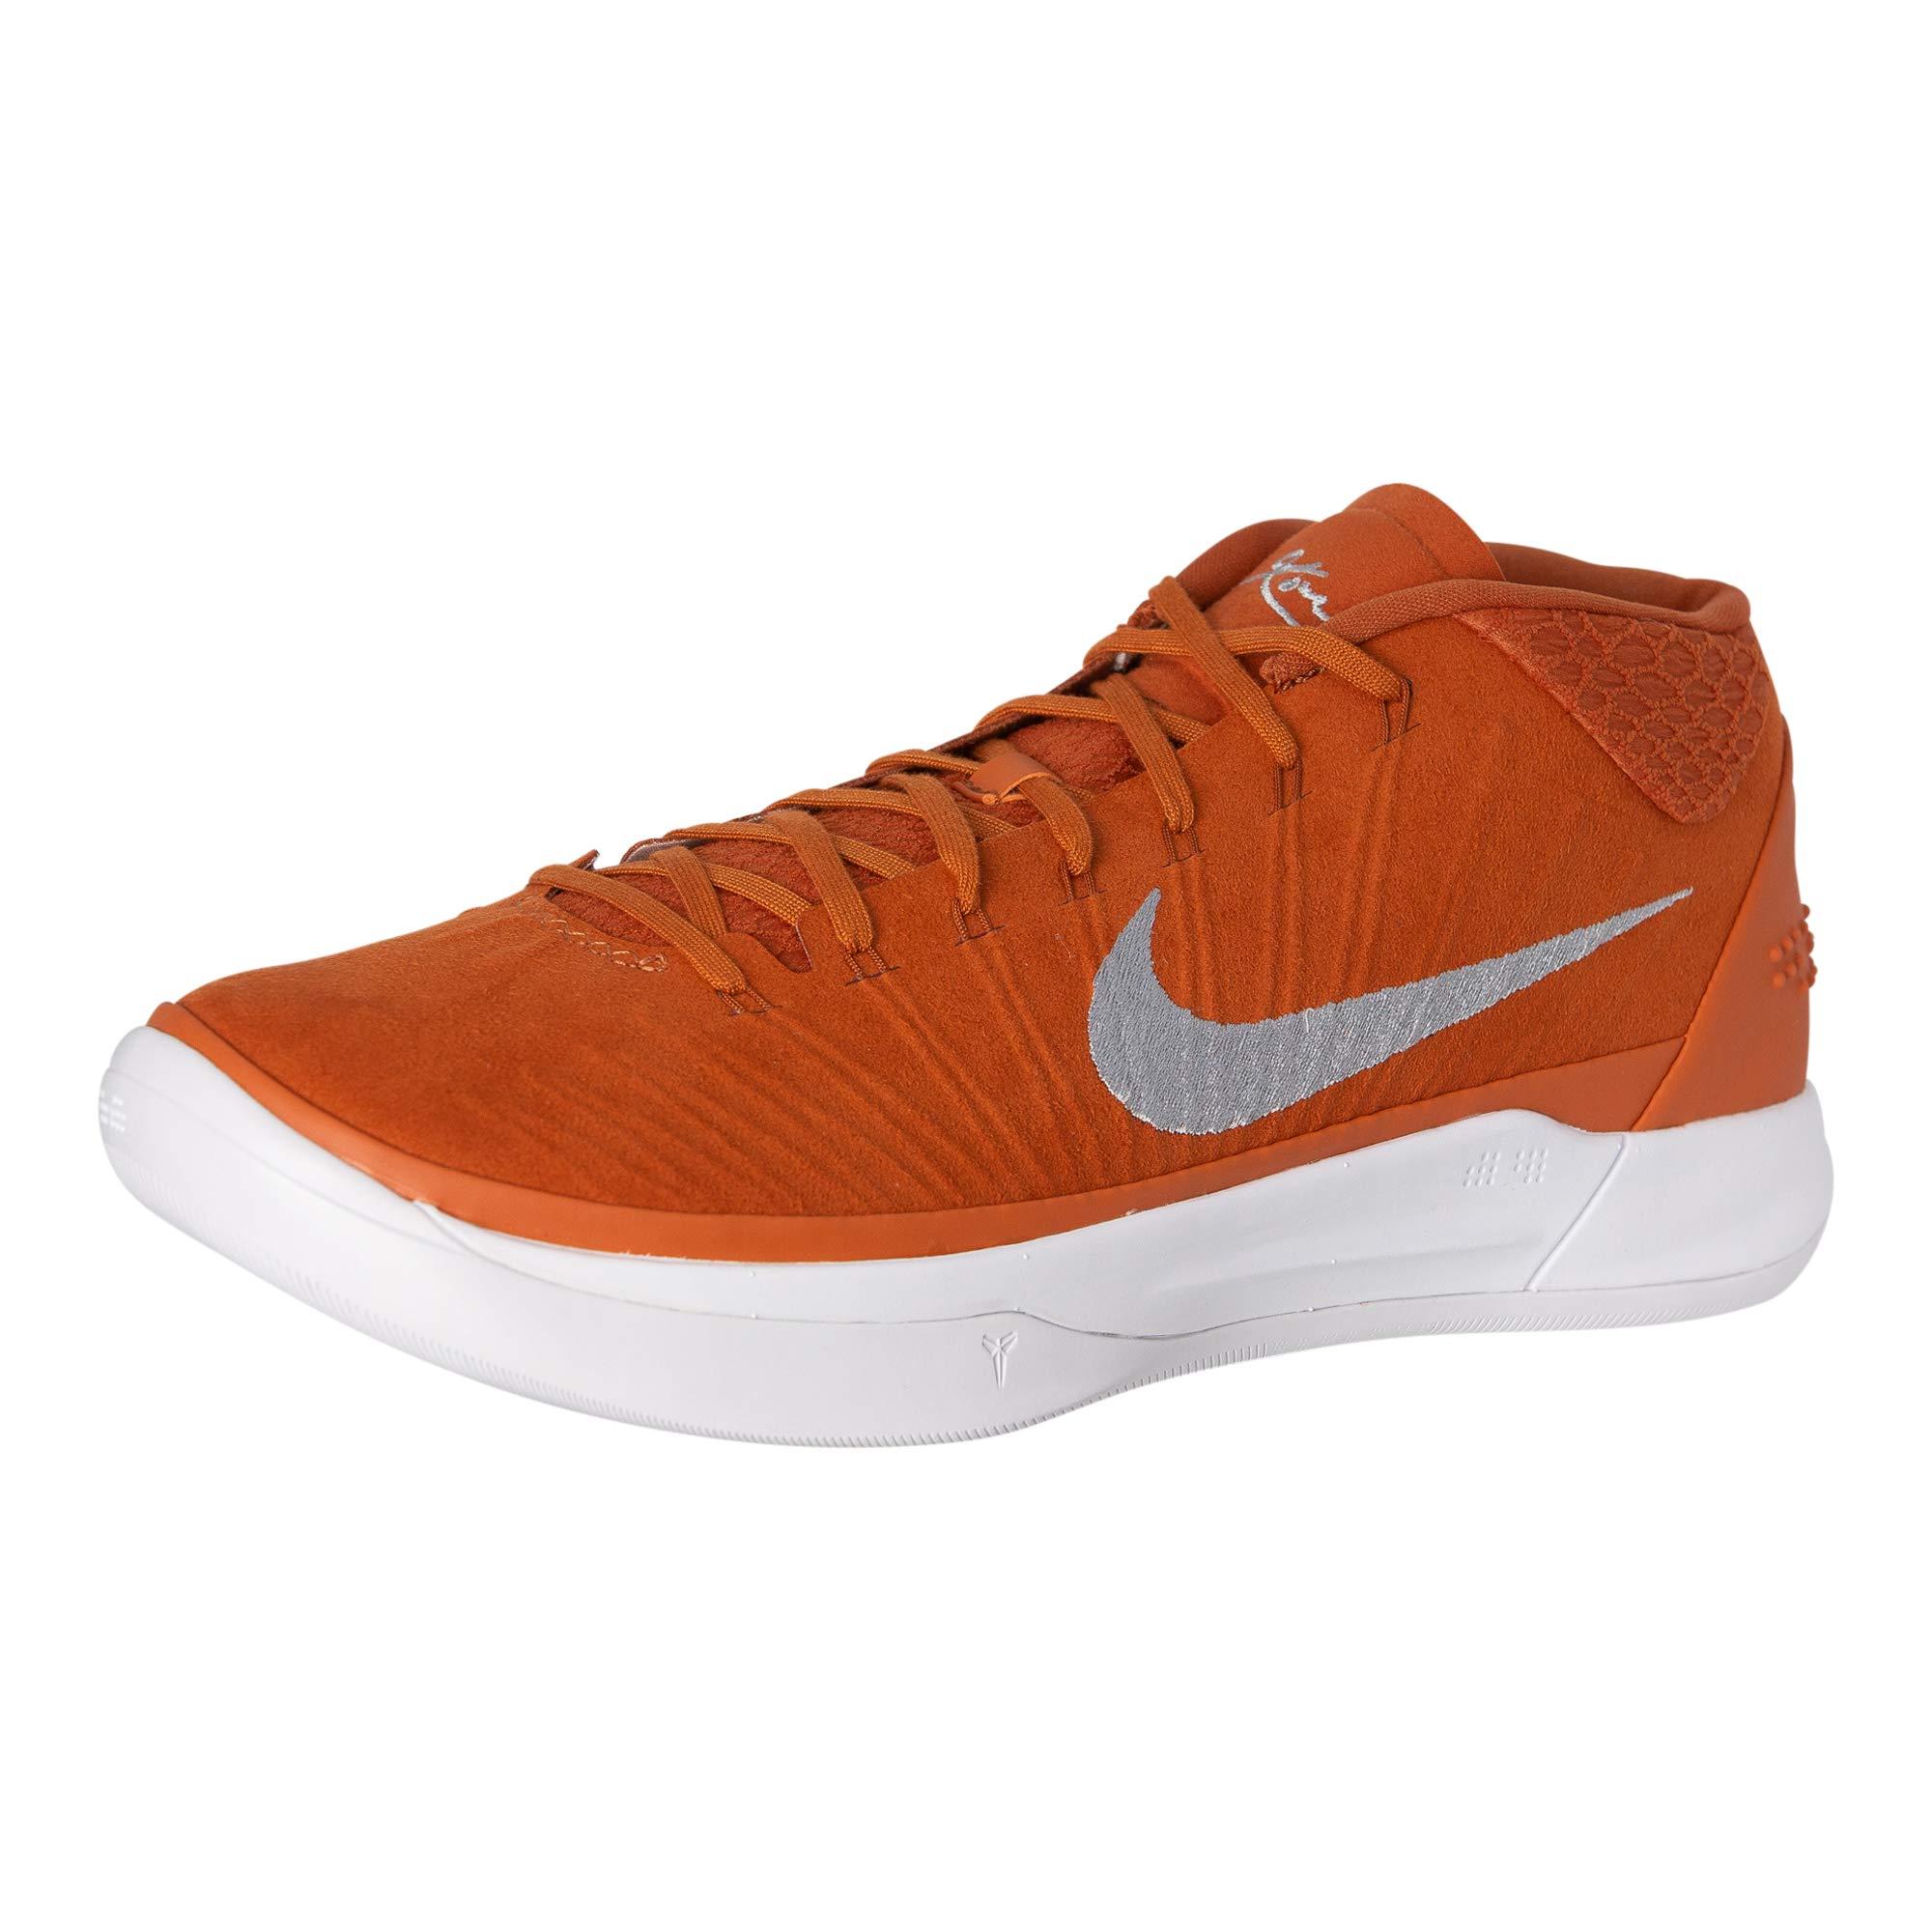 3b547c8dca61 Galleon - NIKE Mens Kobe AD Basketball Shoes (12.5 M US